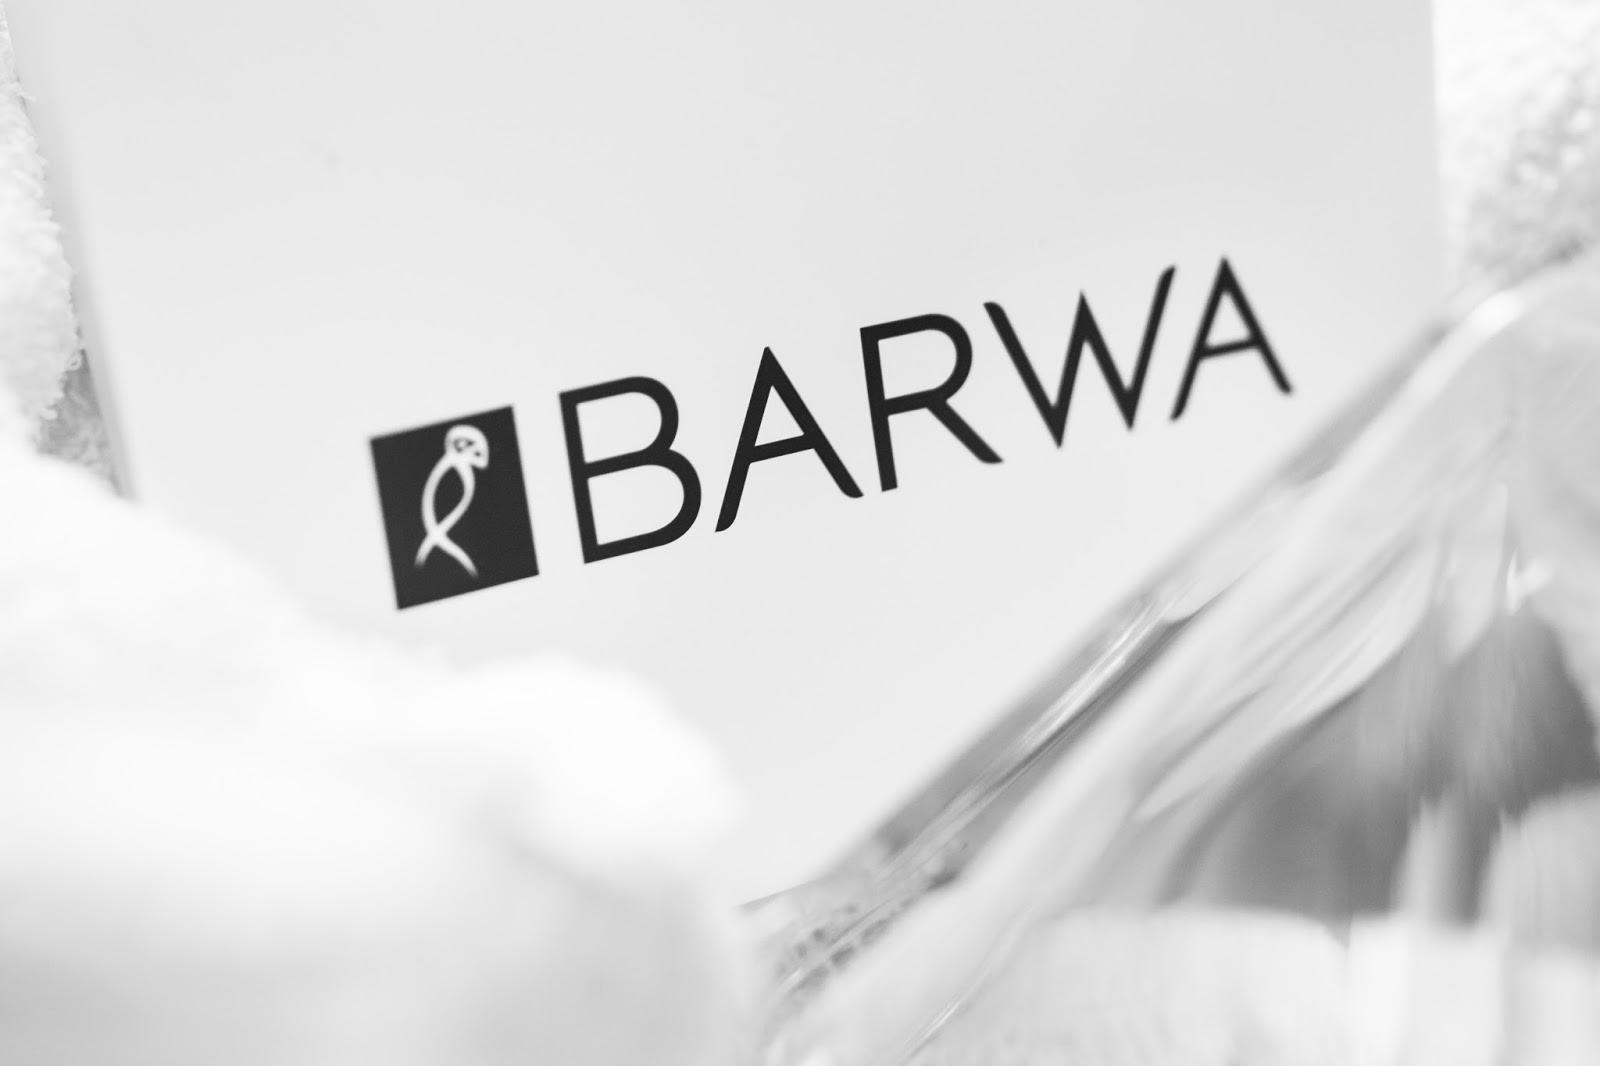 BARWA SIARKOWA